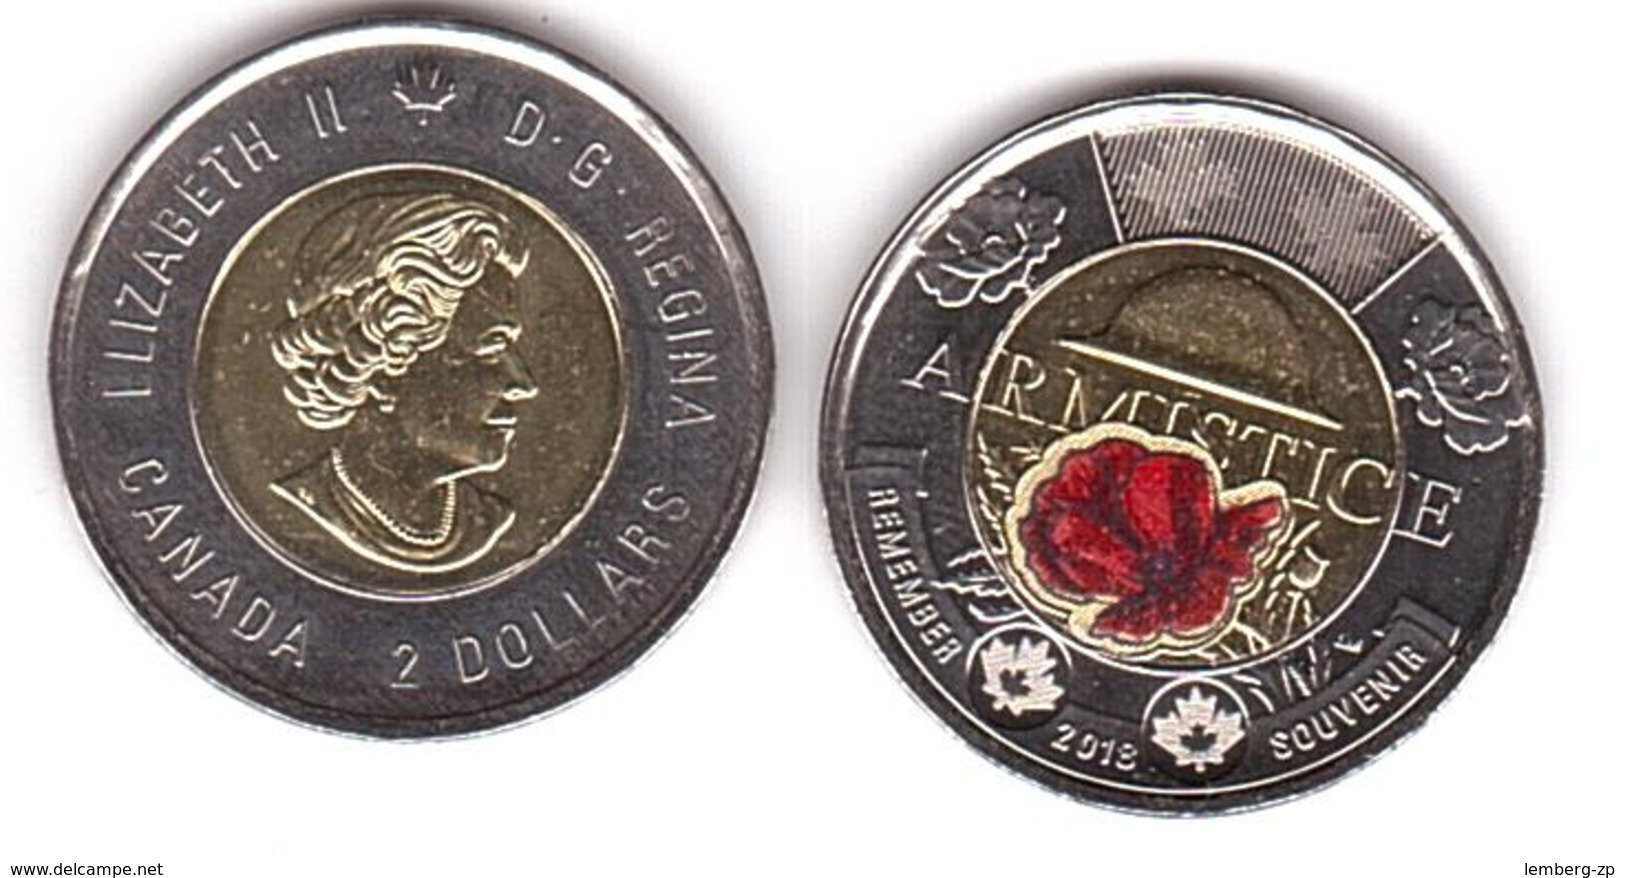 Canada - 2 Dollars 2018 UNC Armistice Lemberg-Zp - Canada